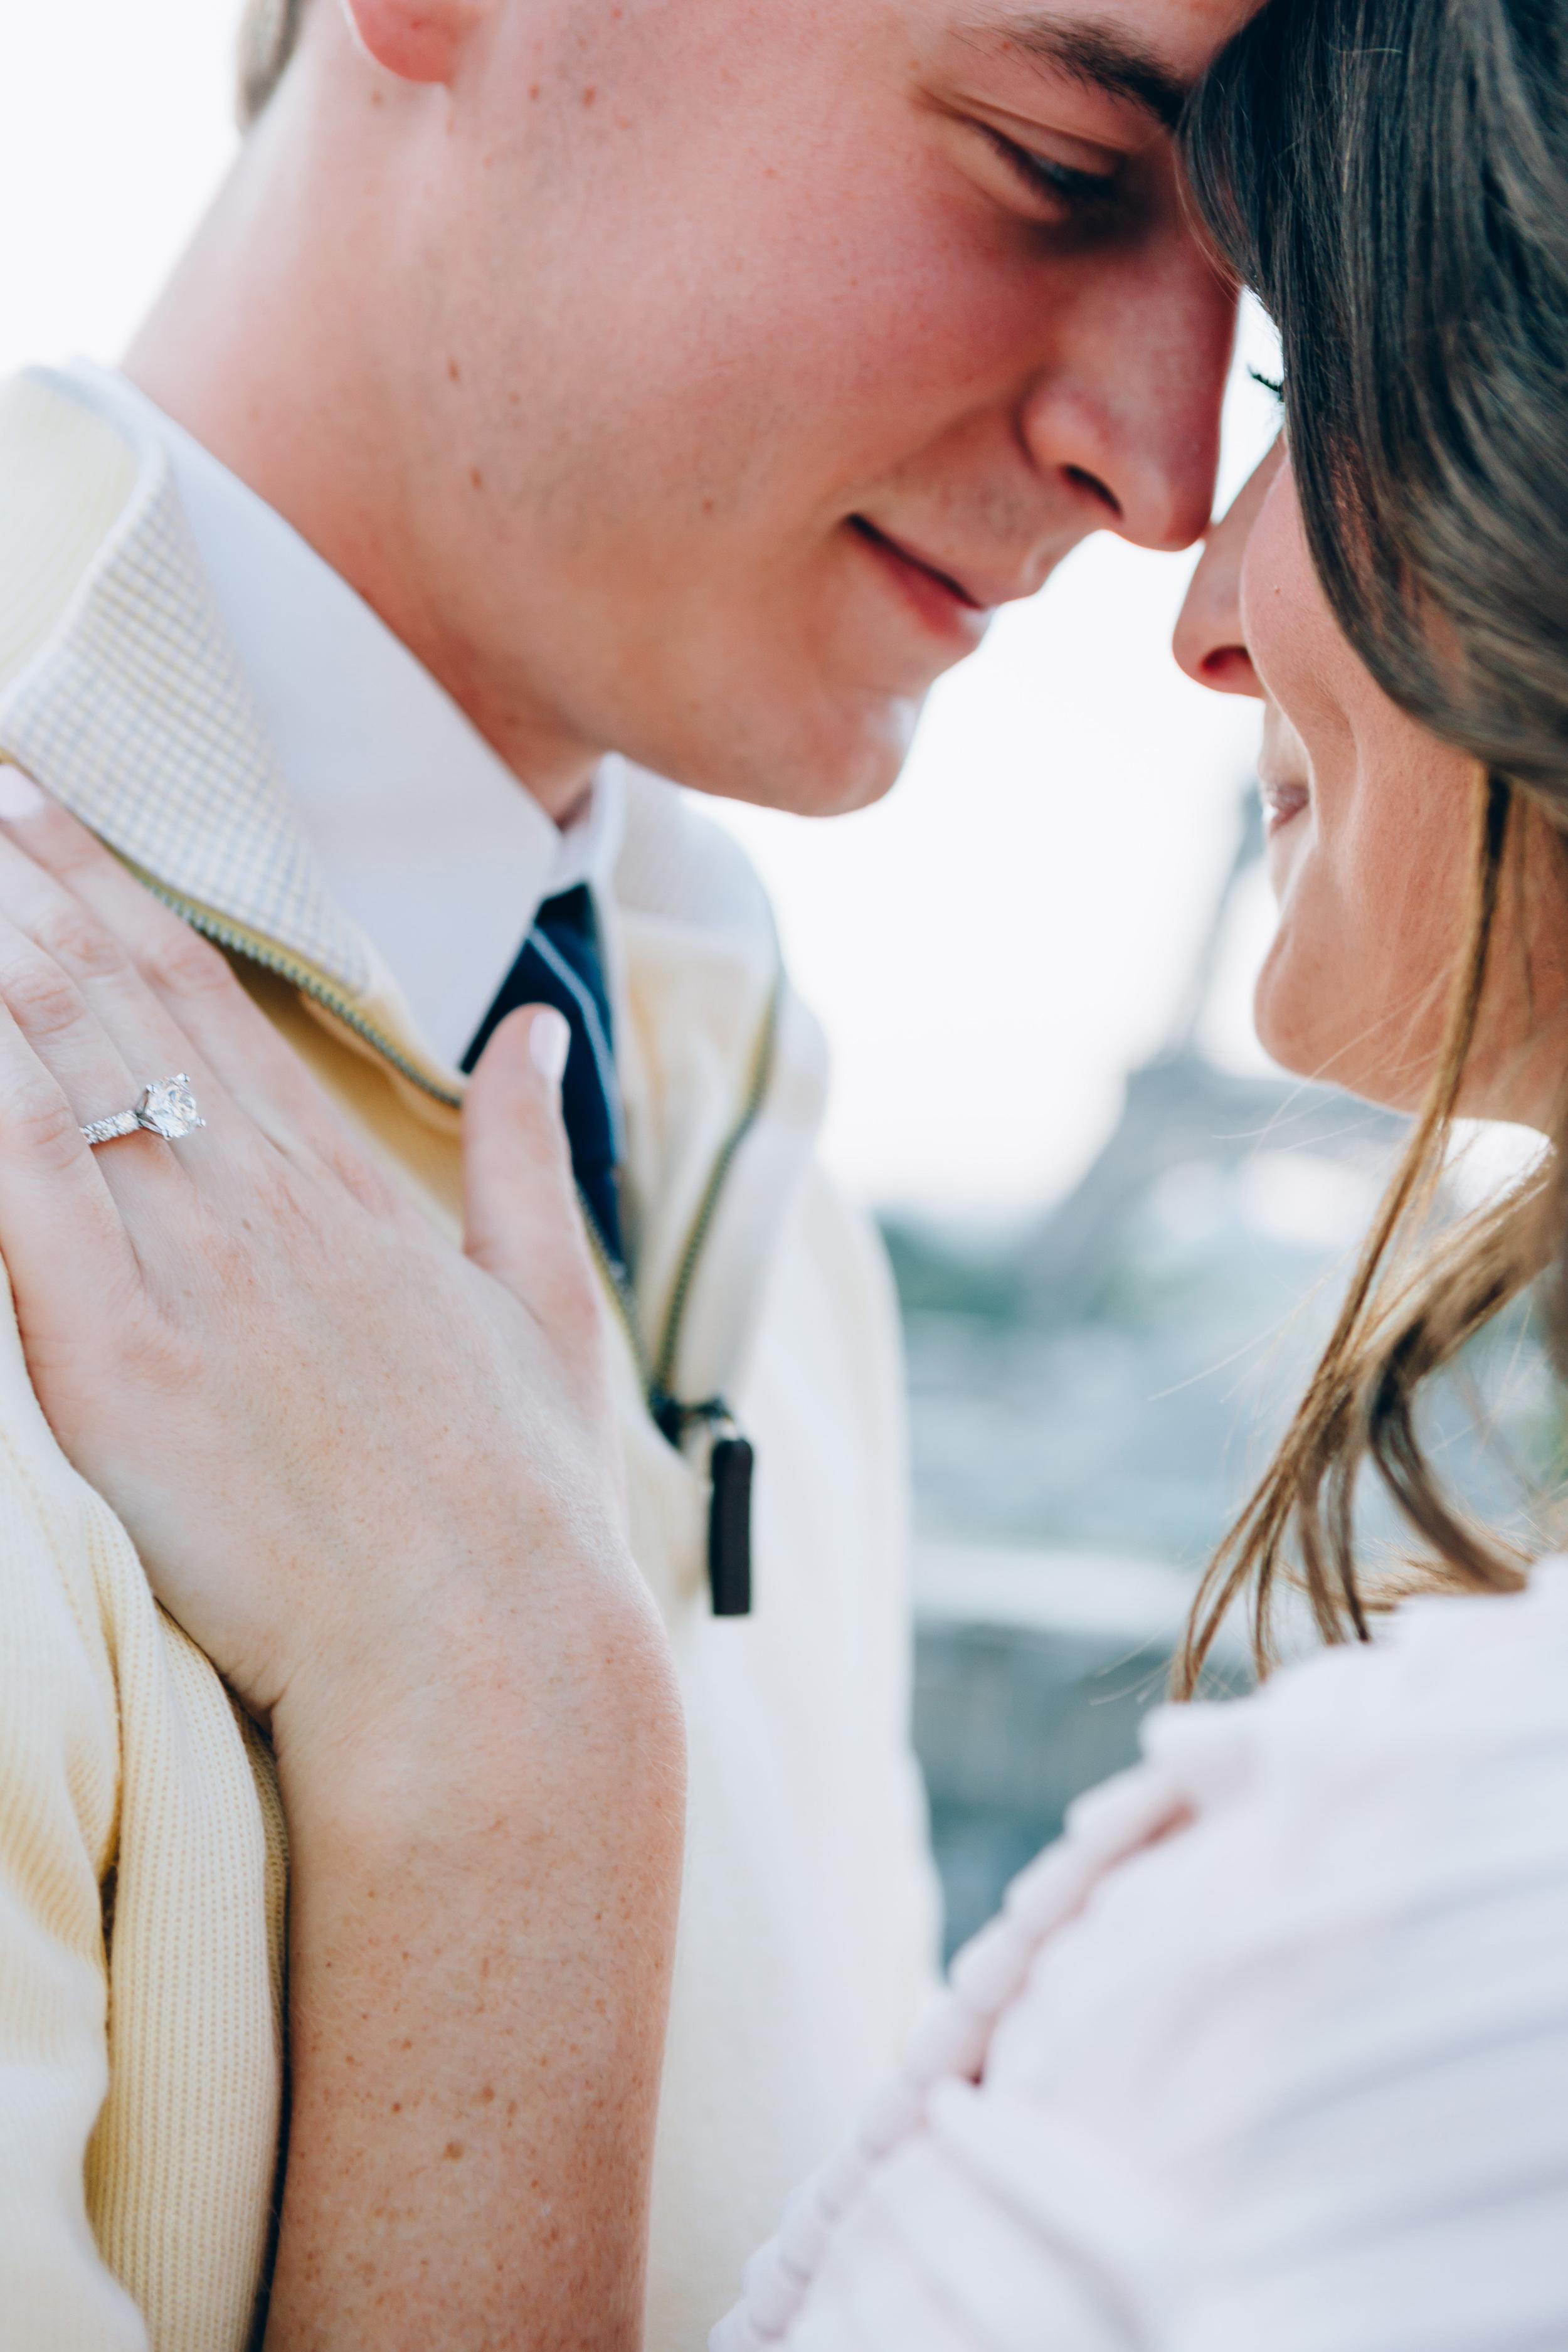 Paris-Photographer-Eiffel-Tower-Surprise-Proposal-She-Said-Yes-Engagement-Ring-Smile-Detail-Iheartparisfr.jpg